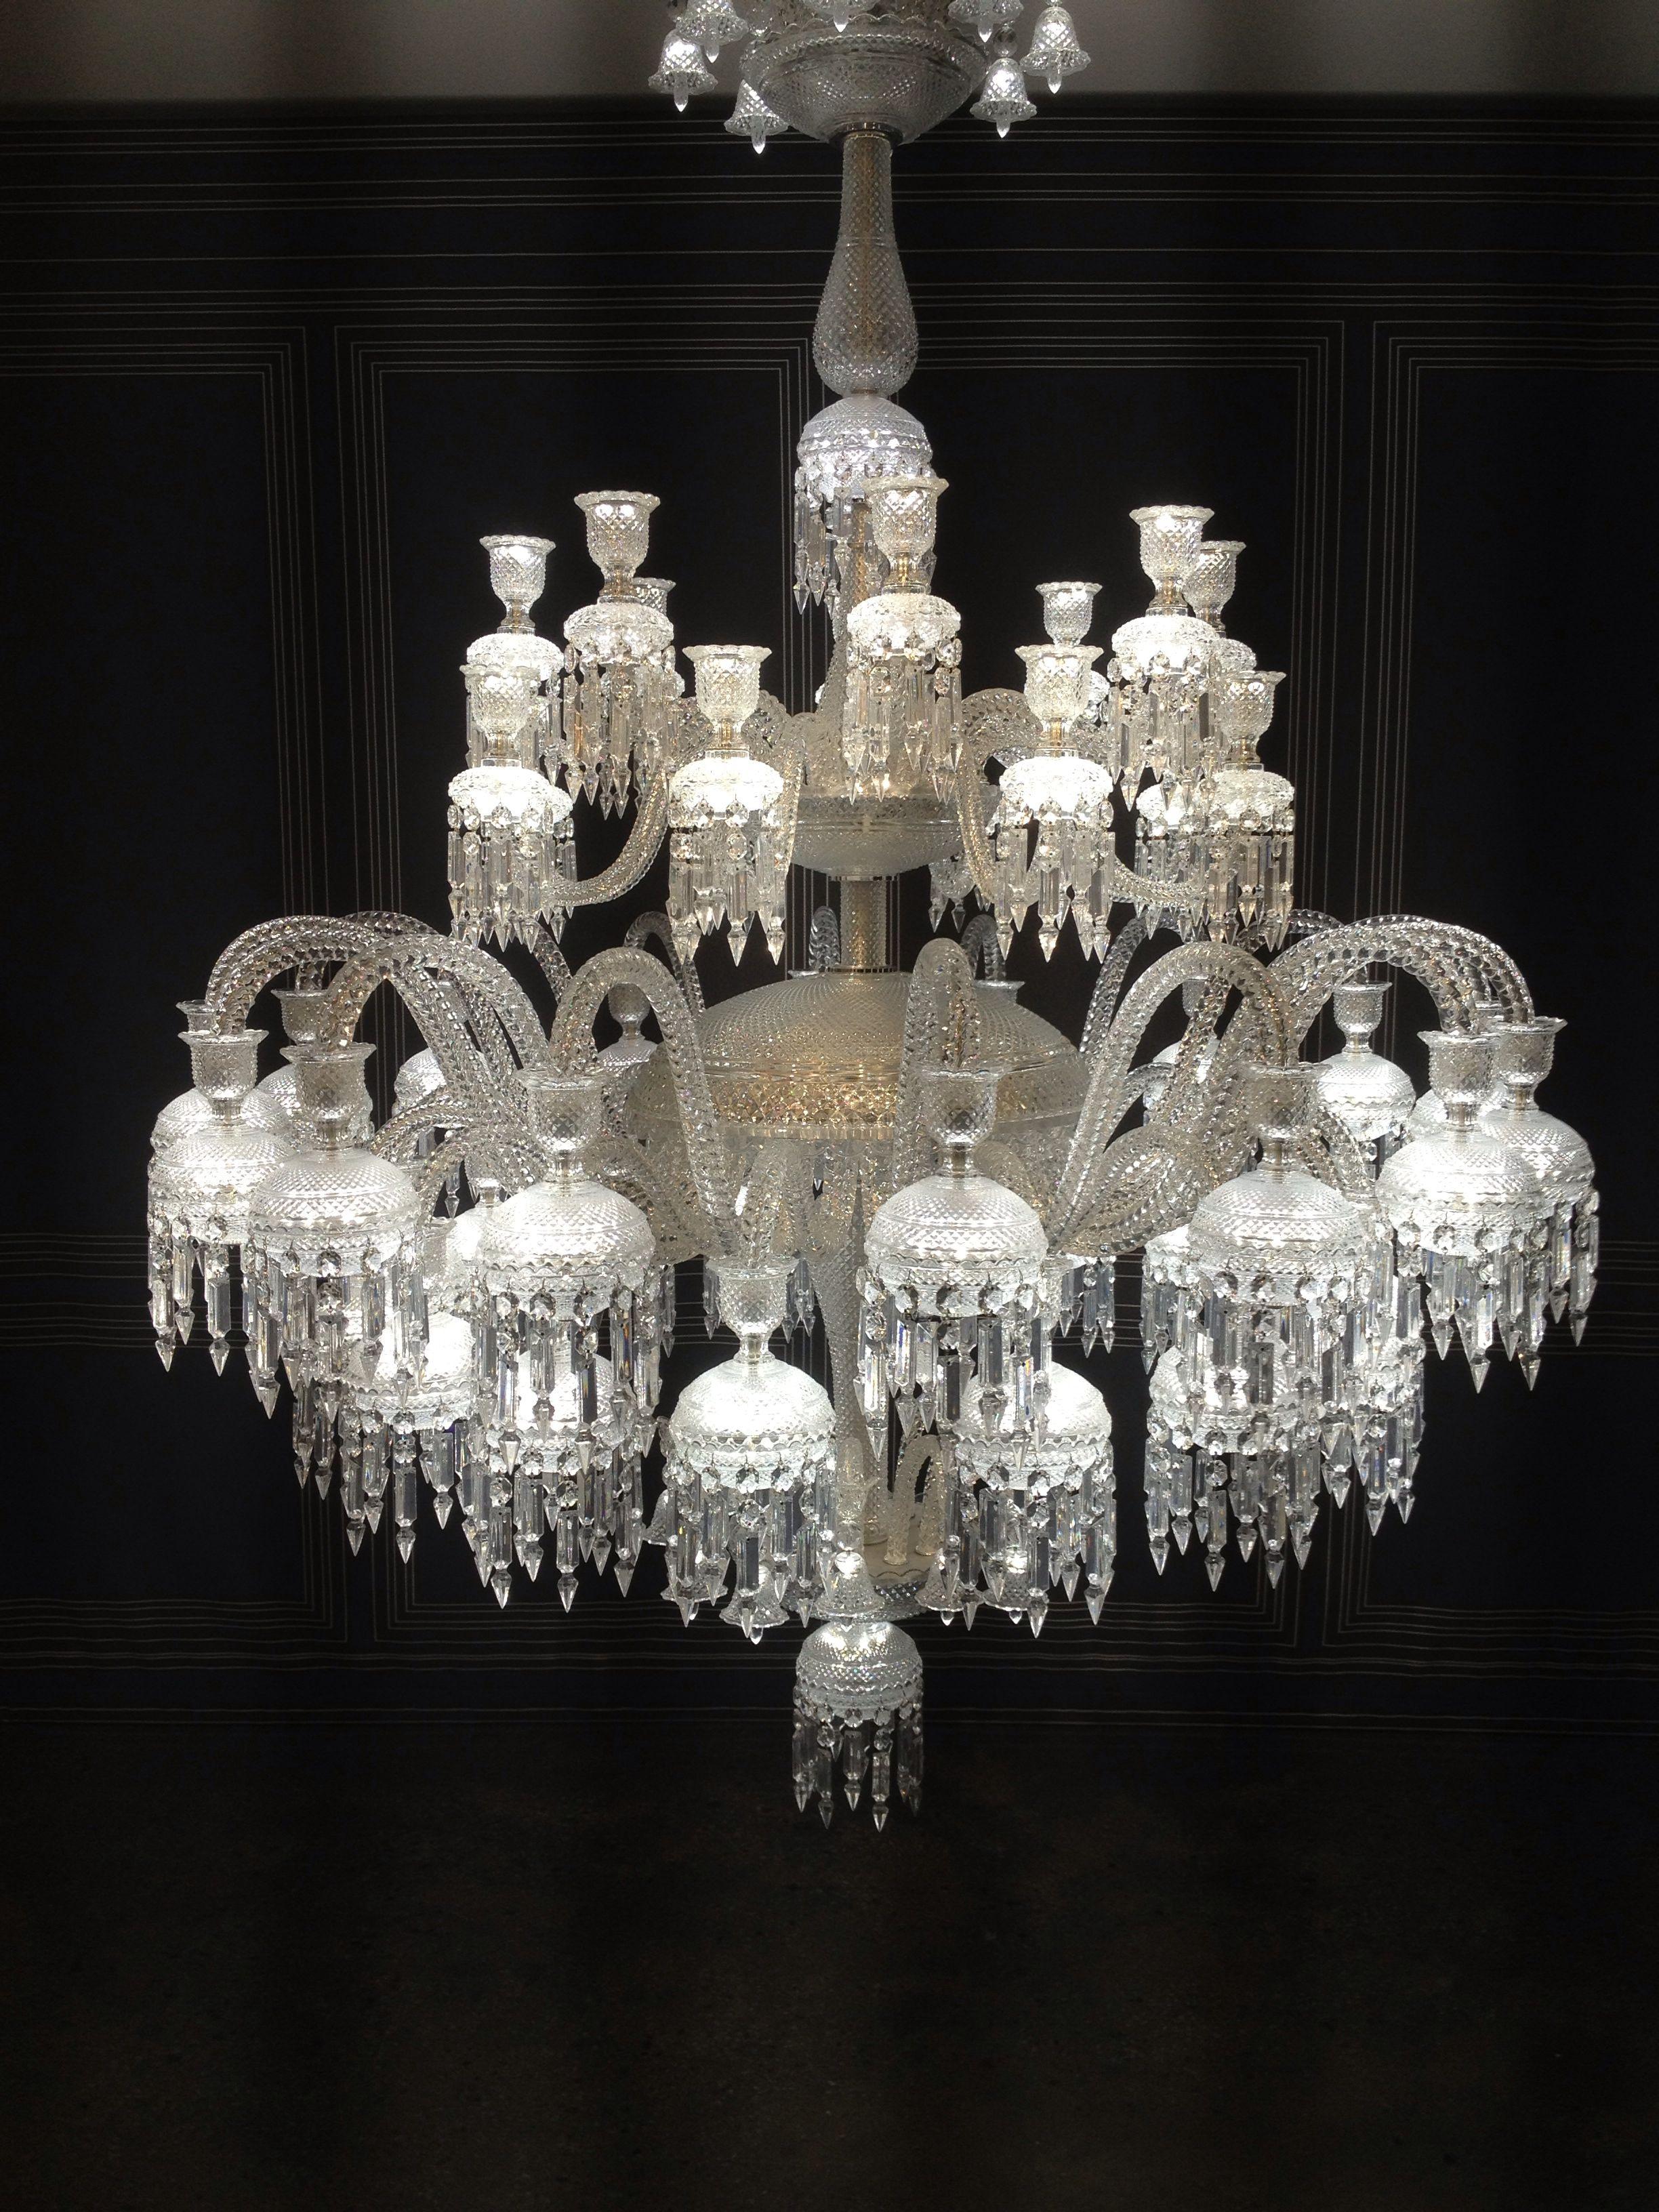 Baccarat lighting